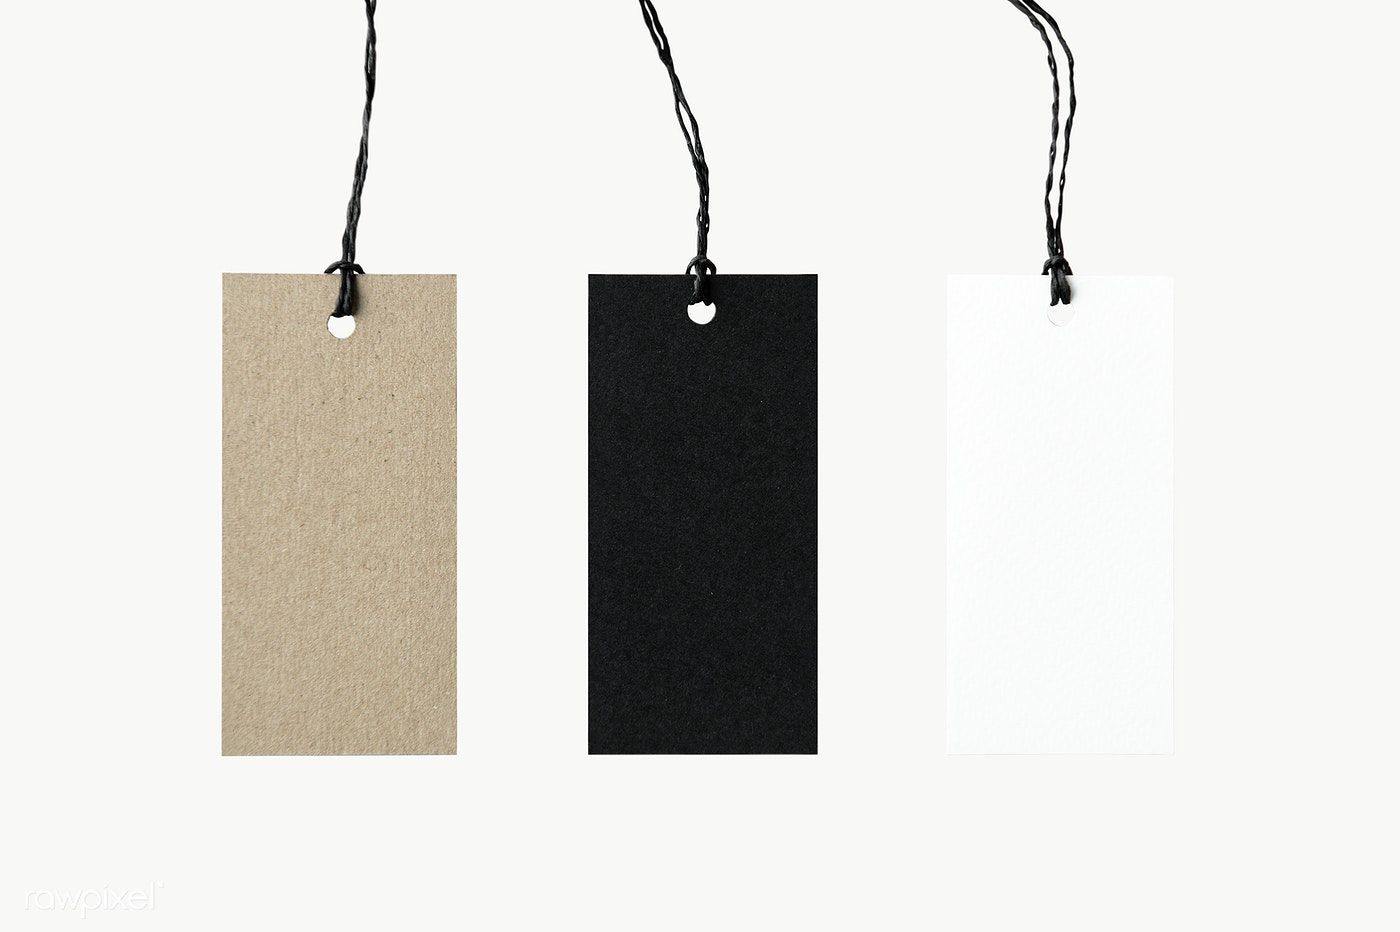 Paper Tag Mockup Premium Image By Rawpixel Com Nam Paper Tags Mockup Handmade Tags